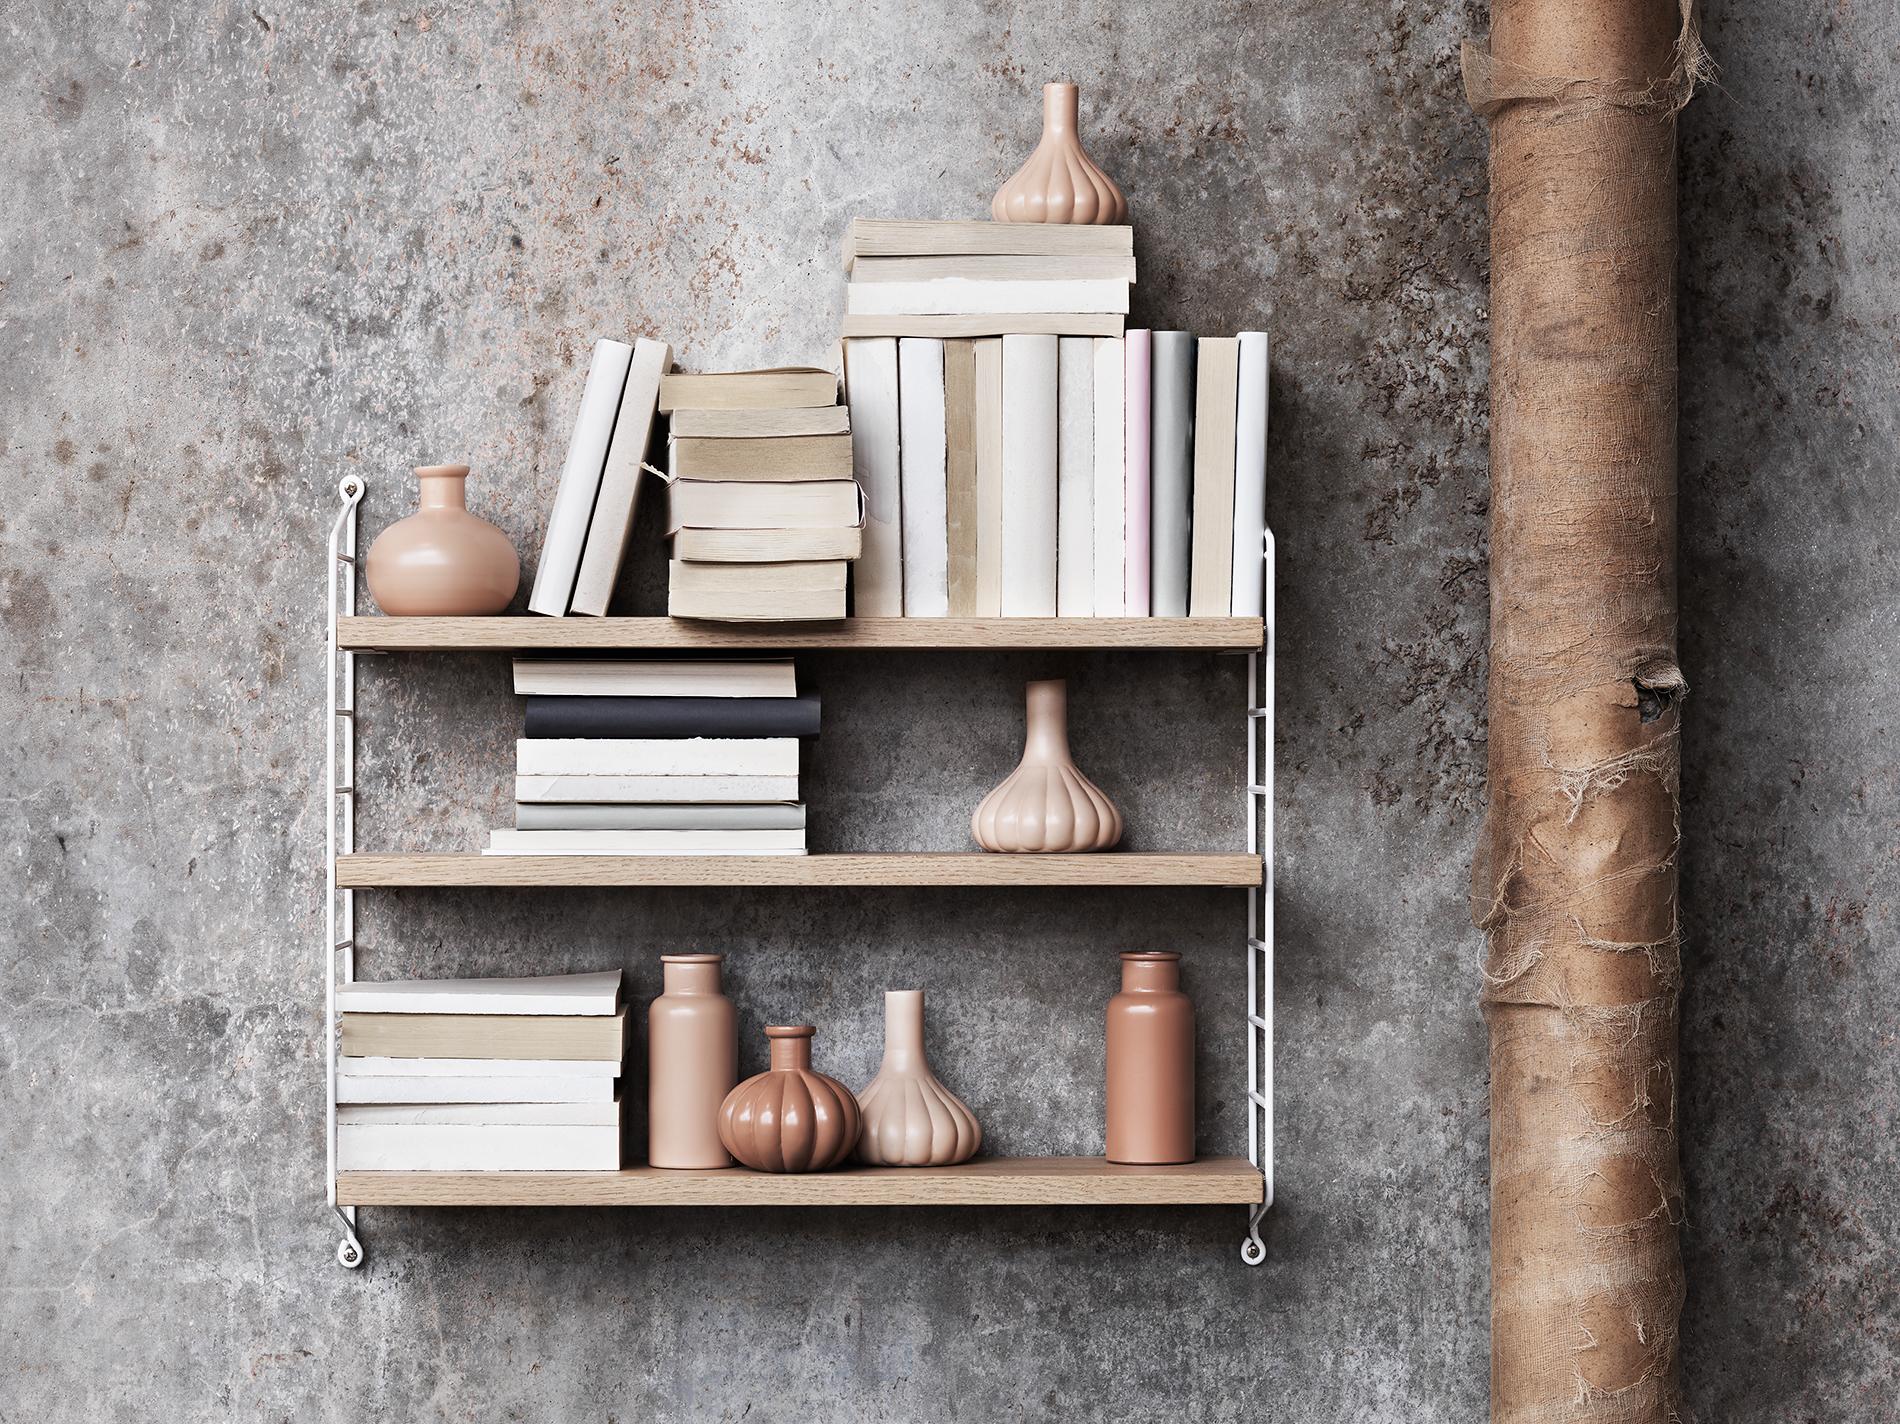 String_2016_Lotta_Agaton concrete bedroom shelf styling closeup